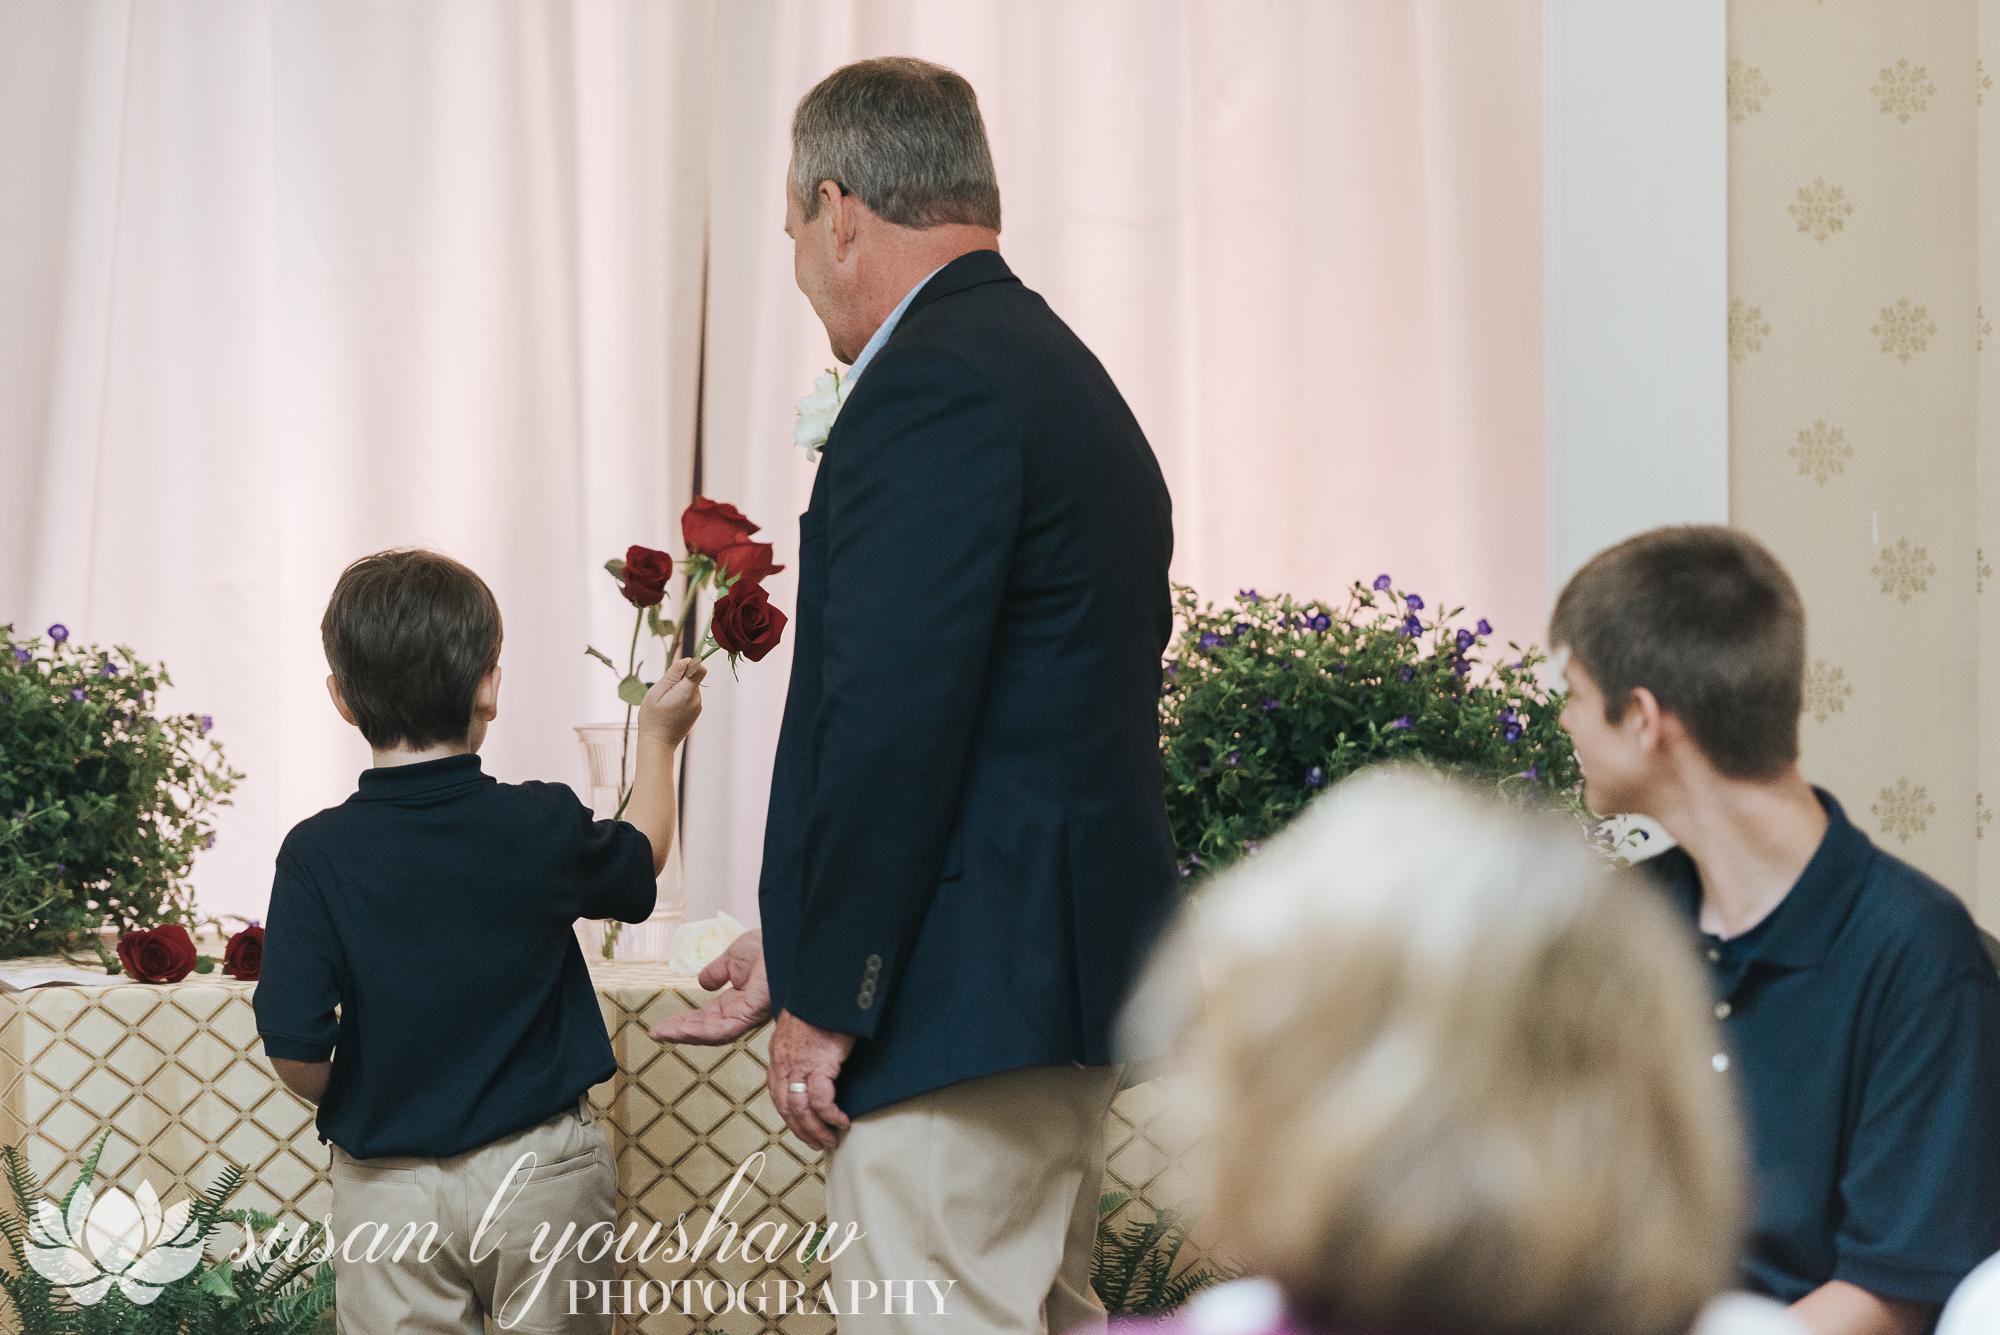 BLOG Carolyn Adams and Jim McCune 07-04-2018 SLY Photography-91.jpg